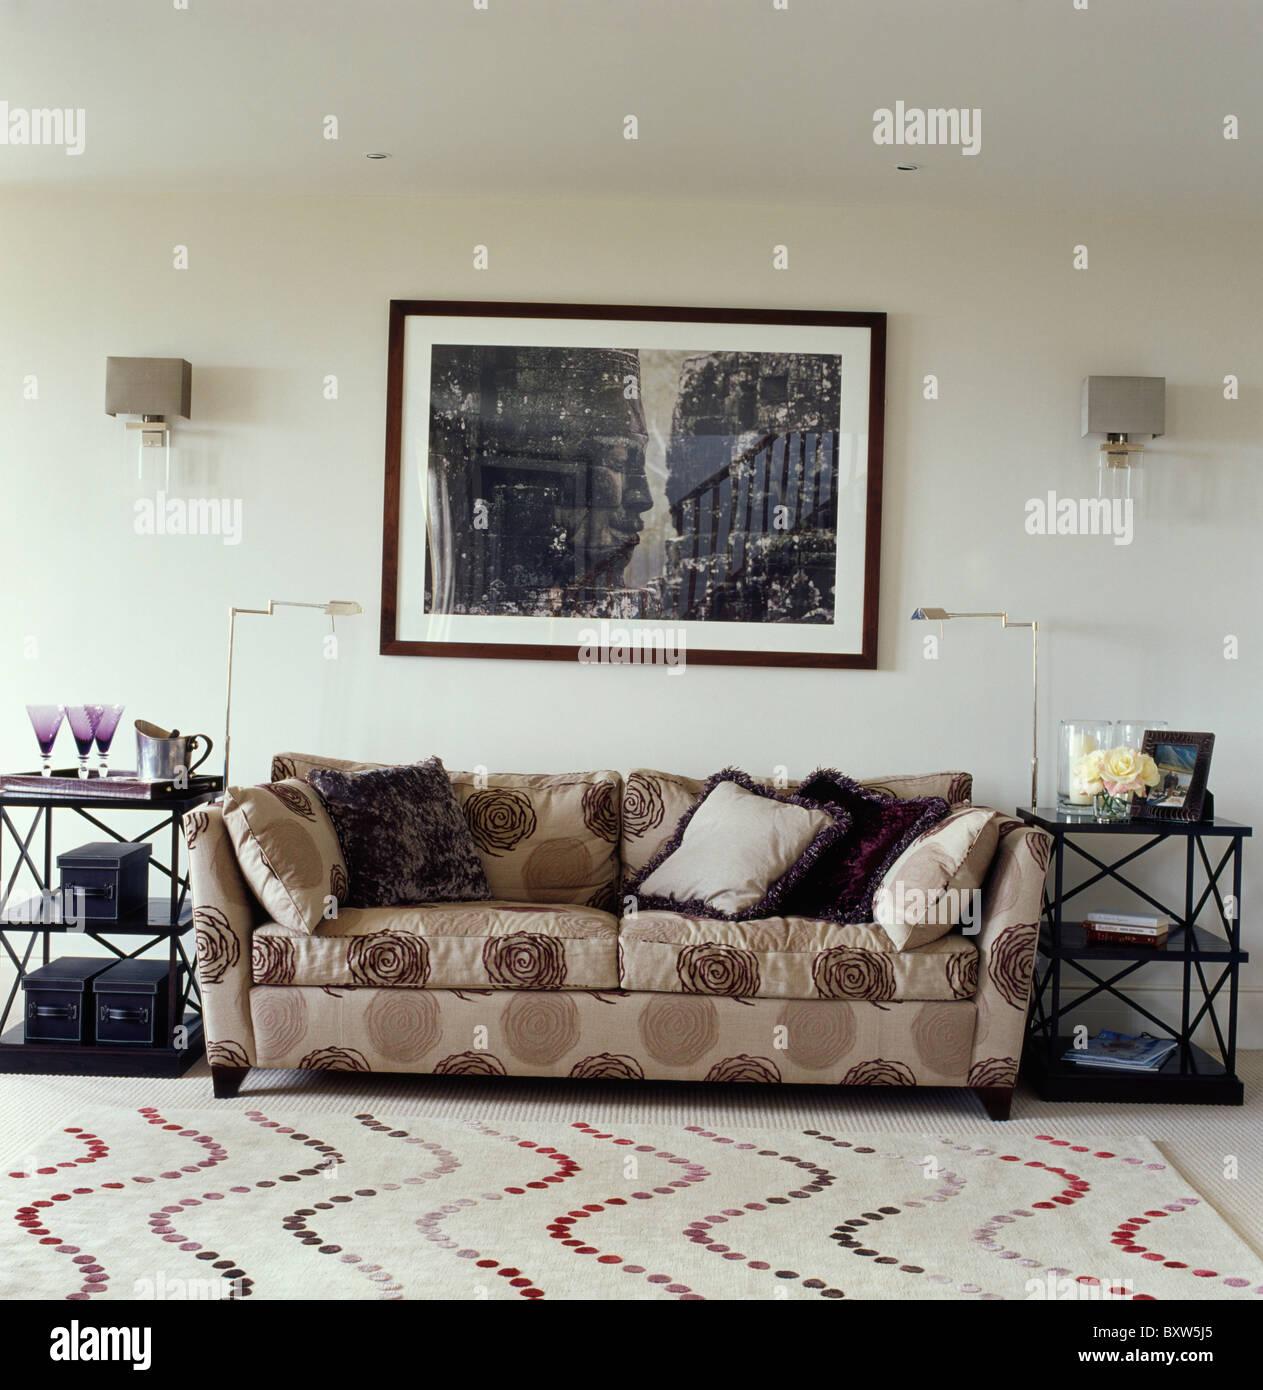 Große schwarze + weisses Bild oben gemustert Beige Sofa im modernen ...